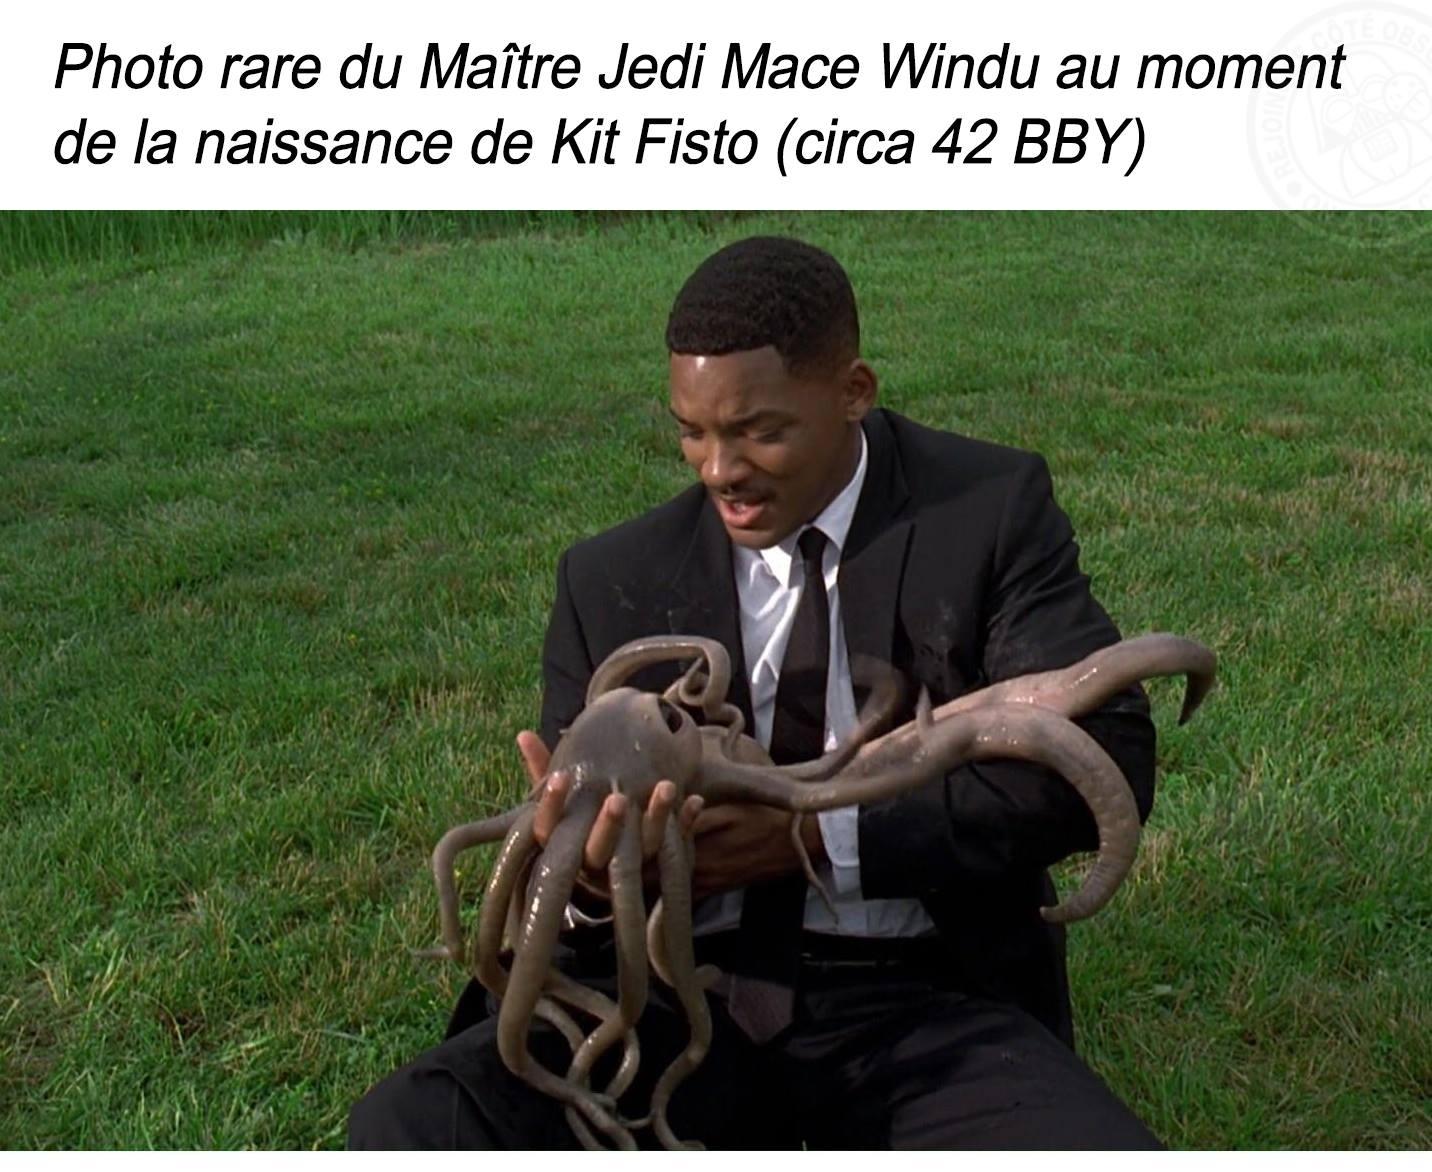 Star Wars meme maitre jedi